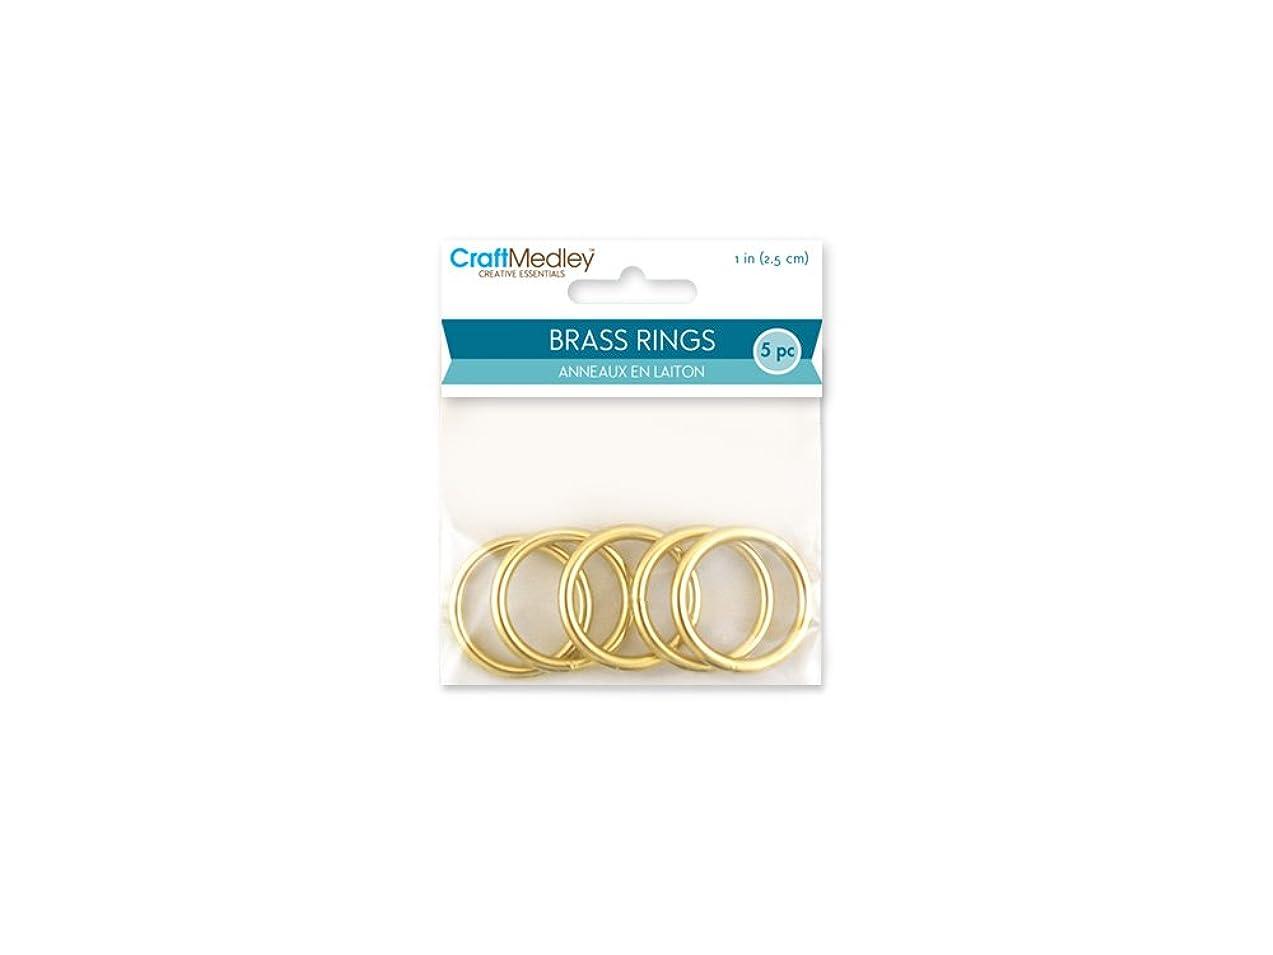 CraftMedley Brass Rings, 1in, Round, 5-Piece, 1